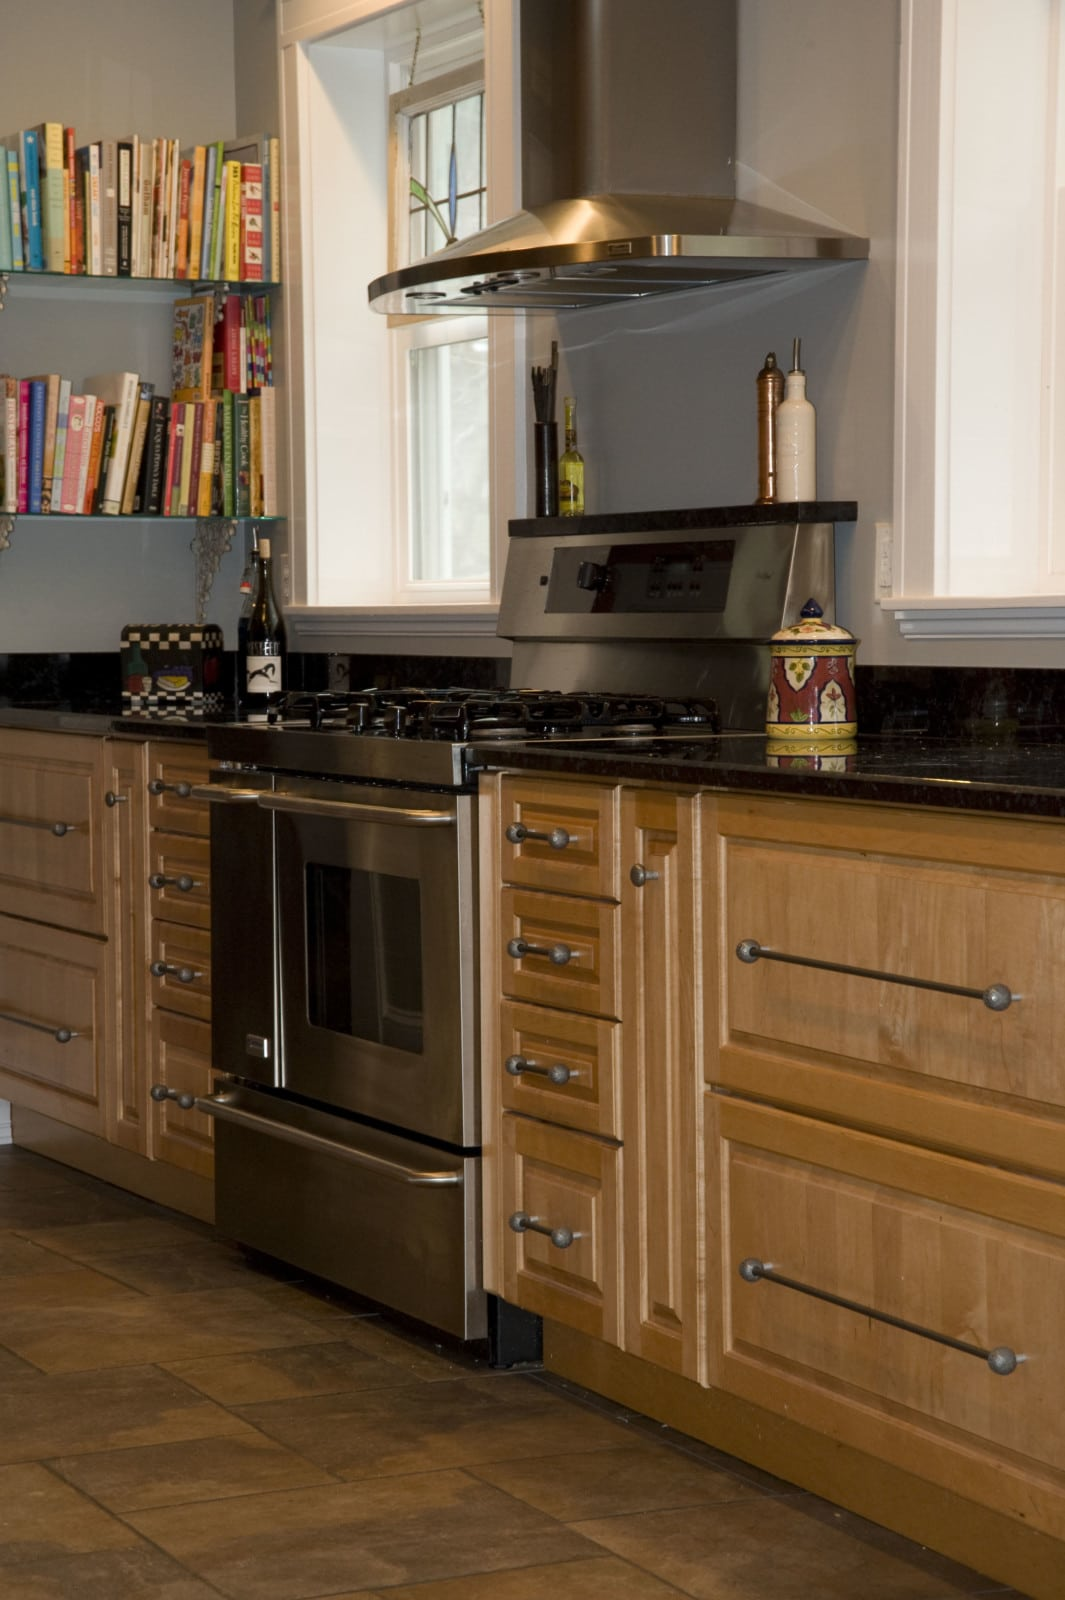 ... Kitchen Renovation Contractor Maryland,kitchen Renovation,kitchen  Design Service,kitchen Renovations Maryland, ...